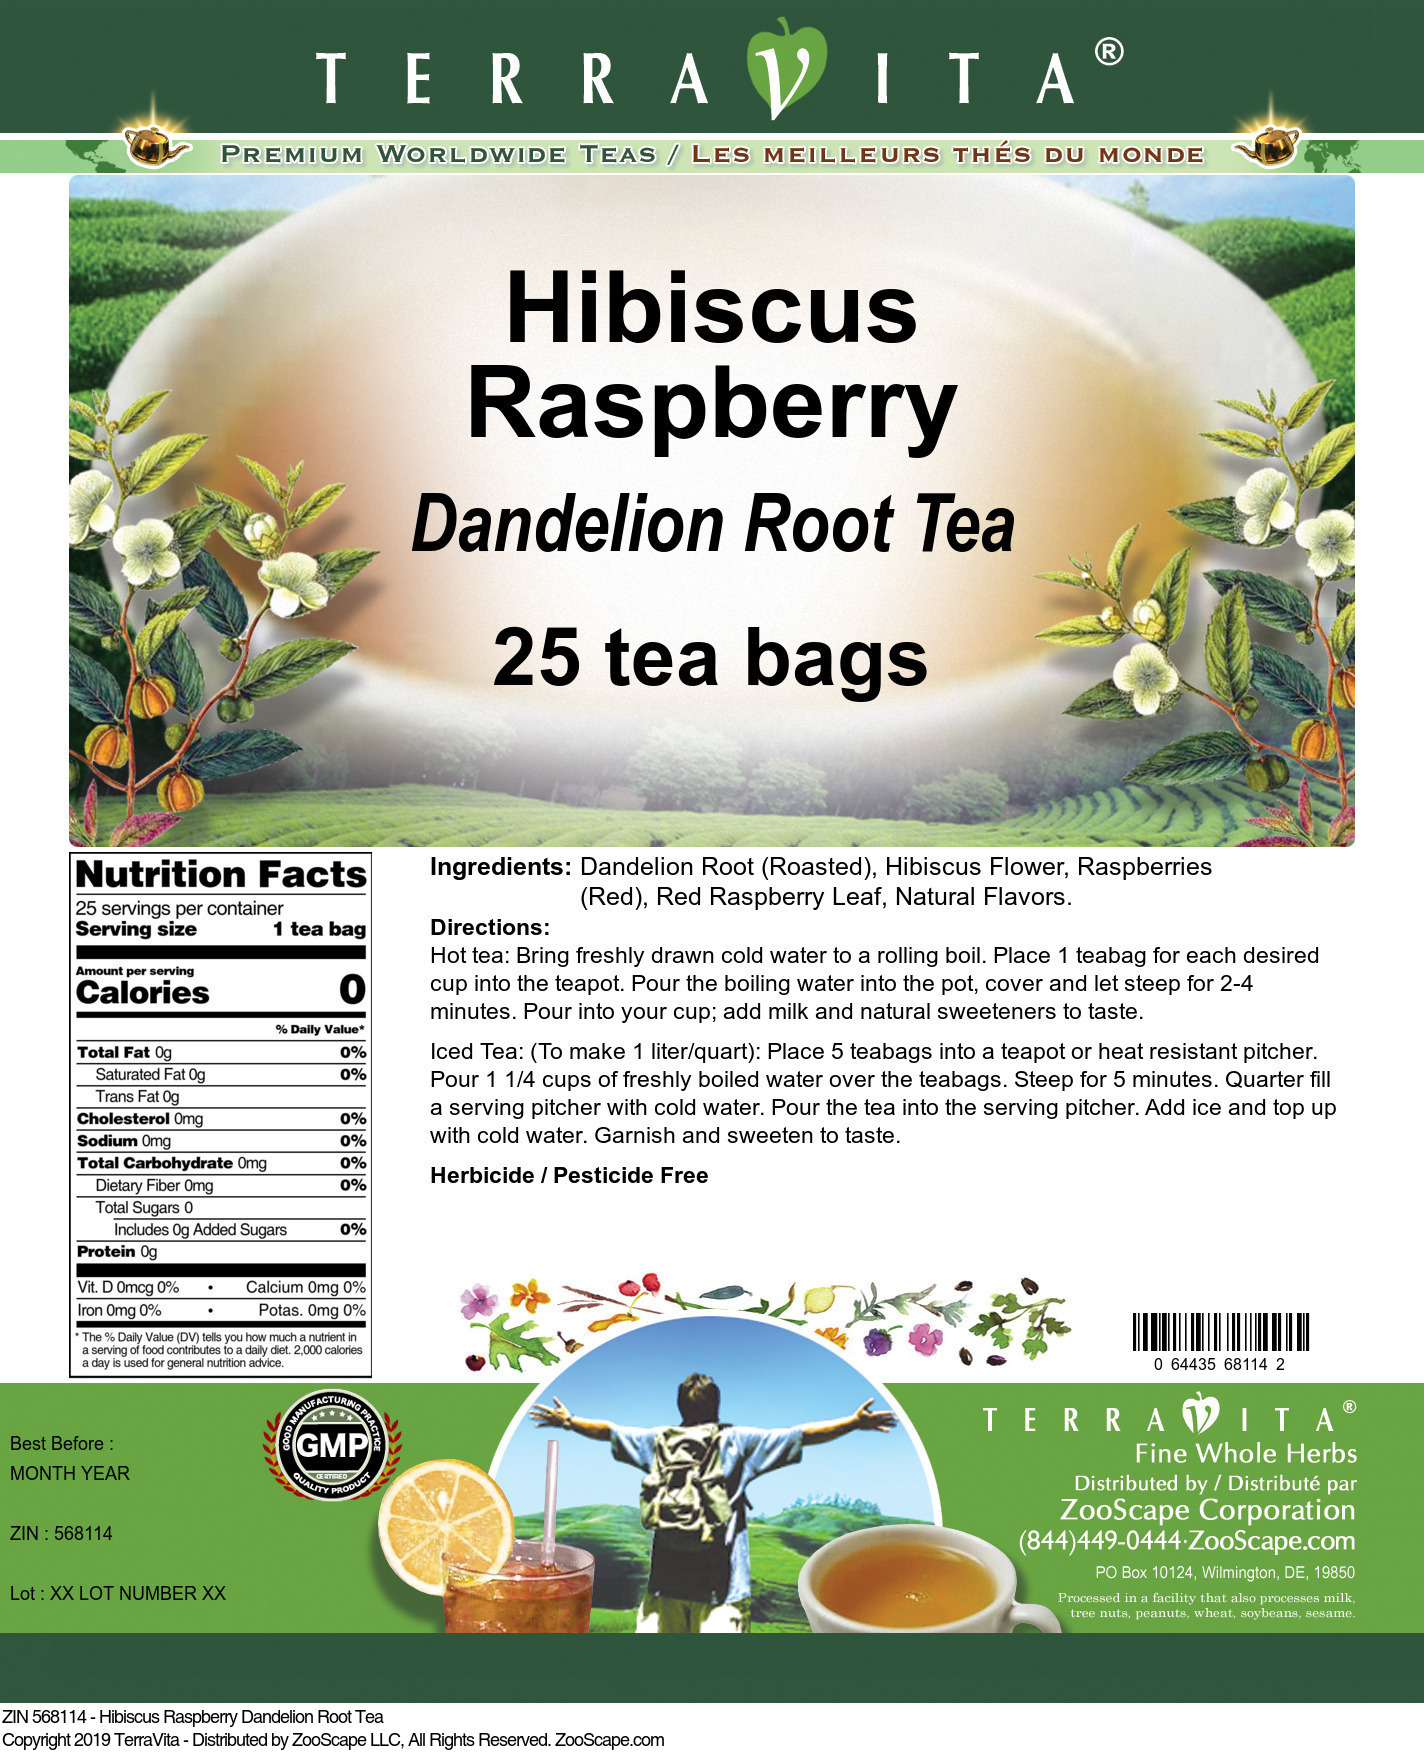 Hibiscus Raspberry Dandelion Root Tea